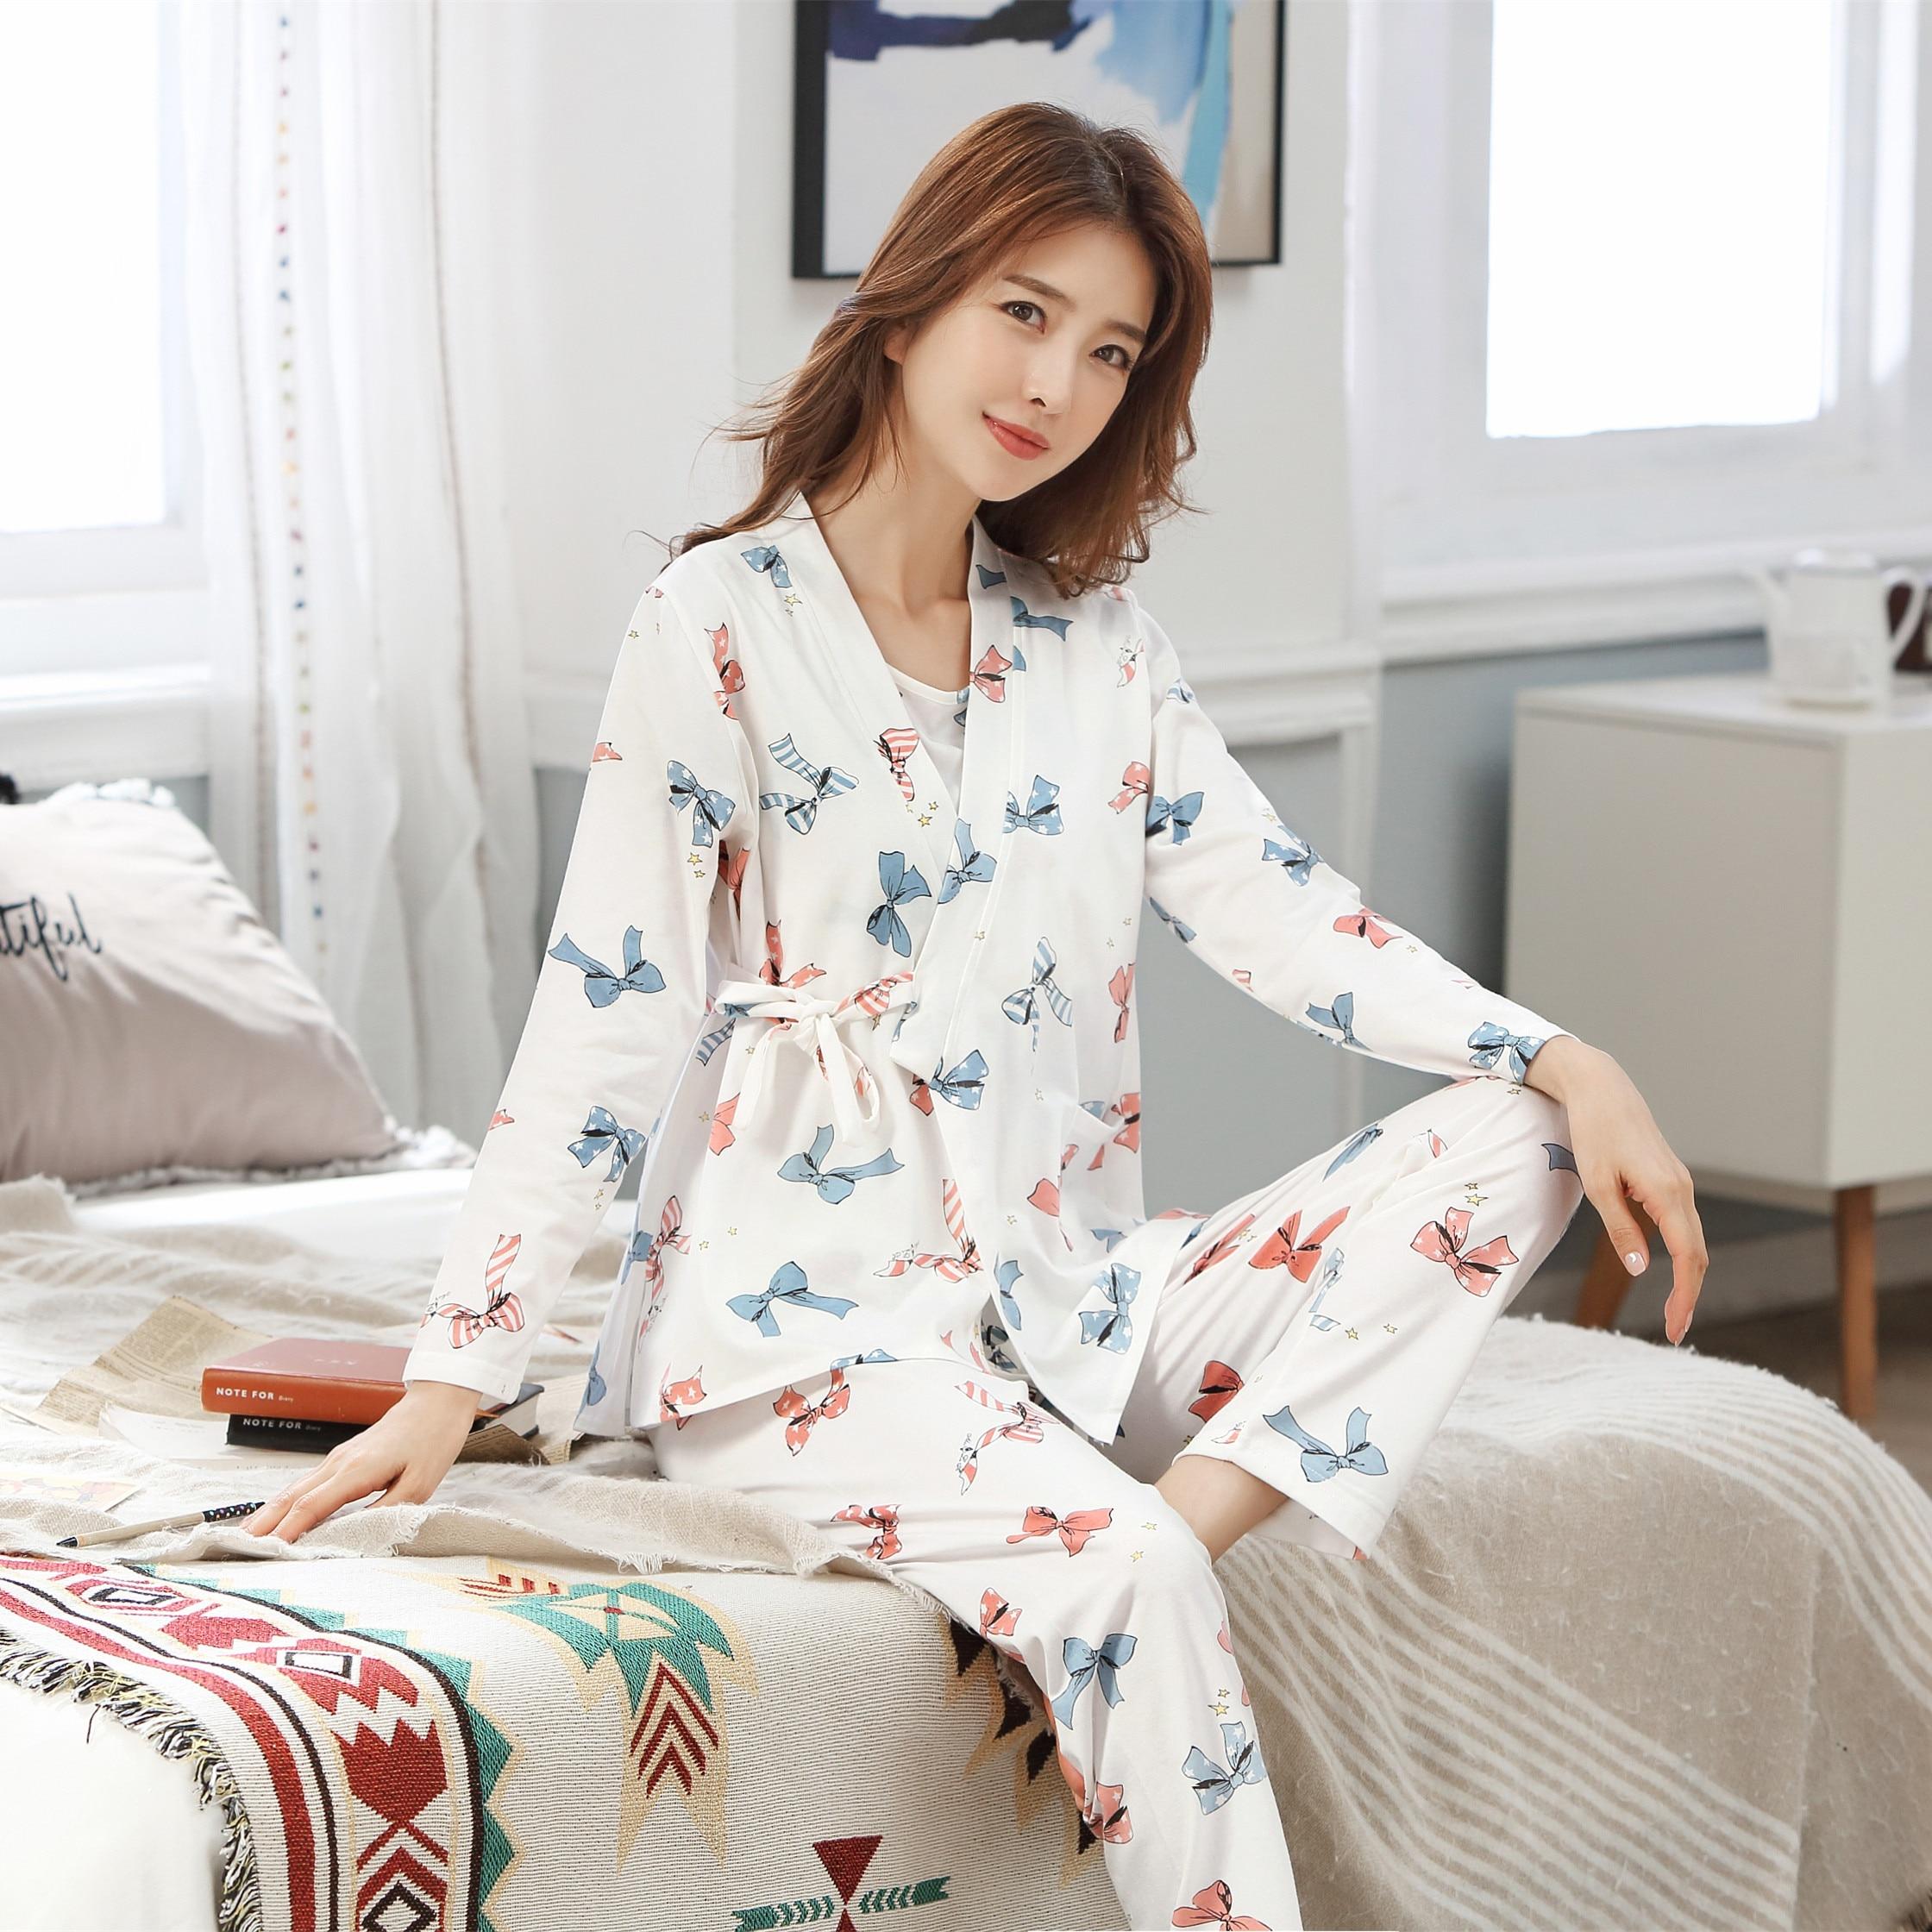 3 PCs/Set Printed Maternity Nursing Sleepwear Breastfeeding Nightwear for Pregnant Women Pregnancy B